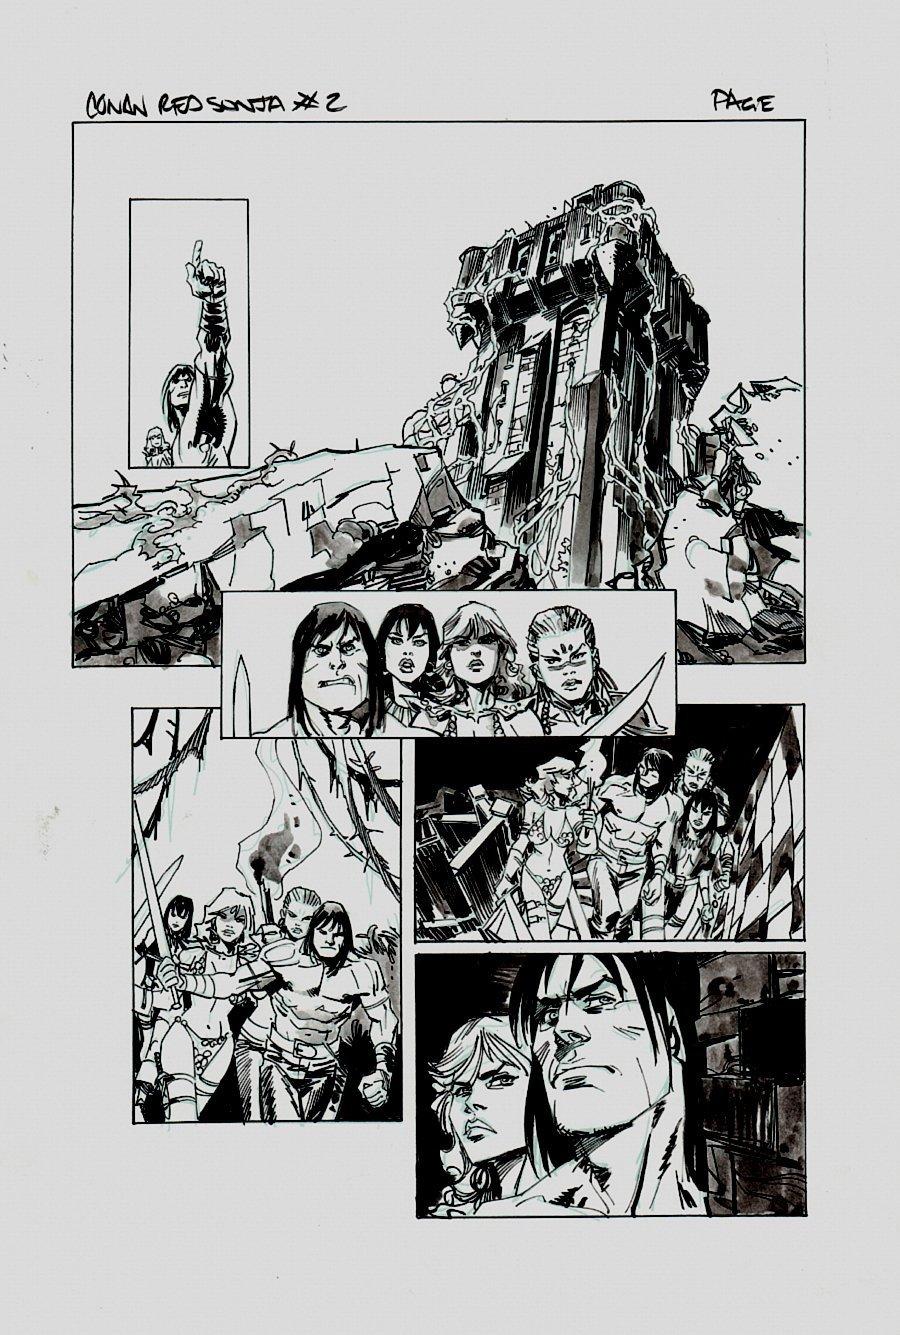 Conan Red Sonja #2 p ? (Conan, Red Sonja, AND BELIT) 2014